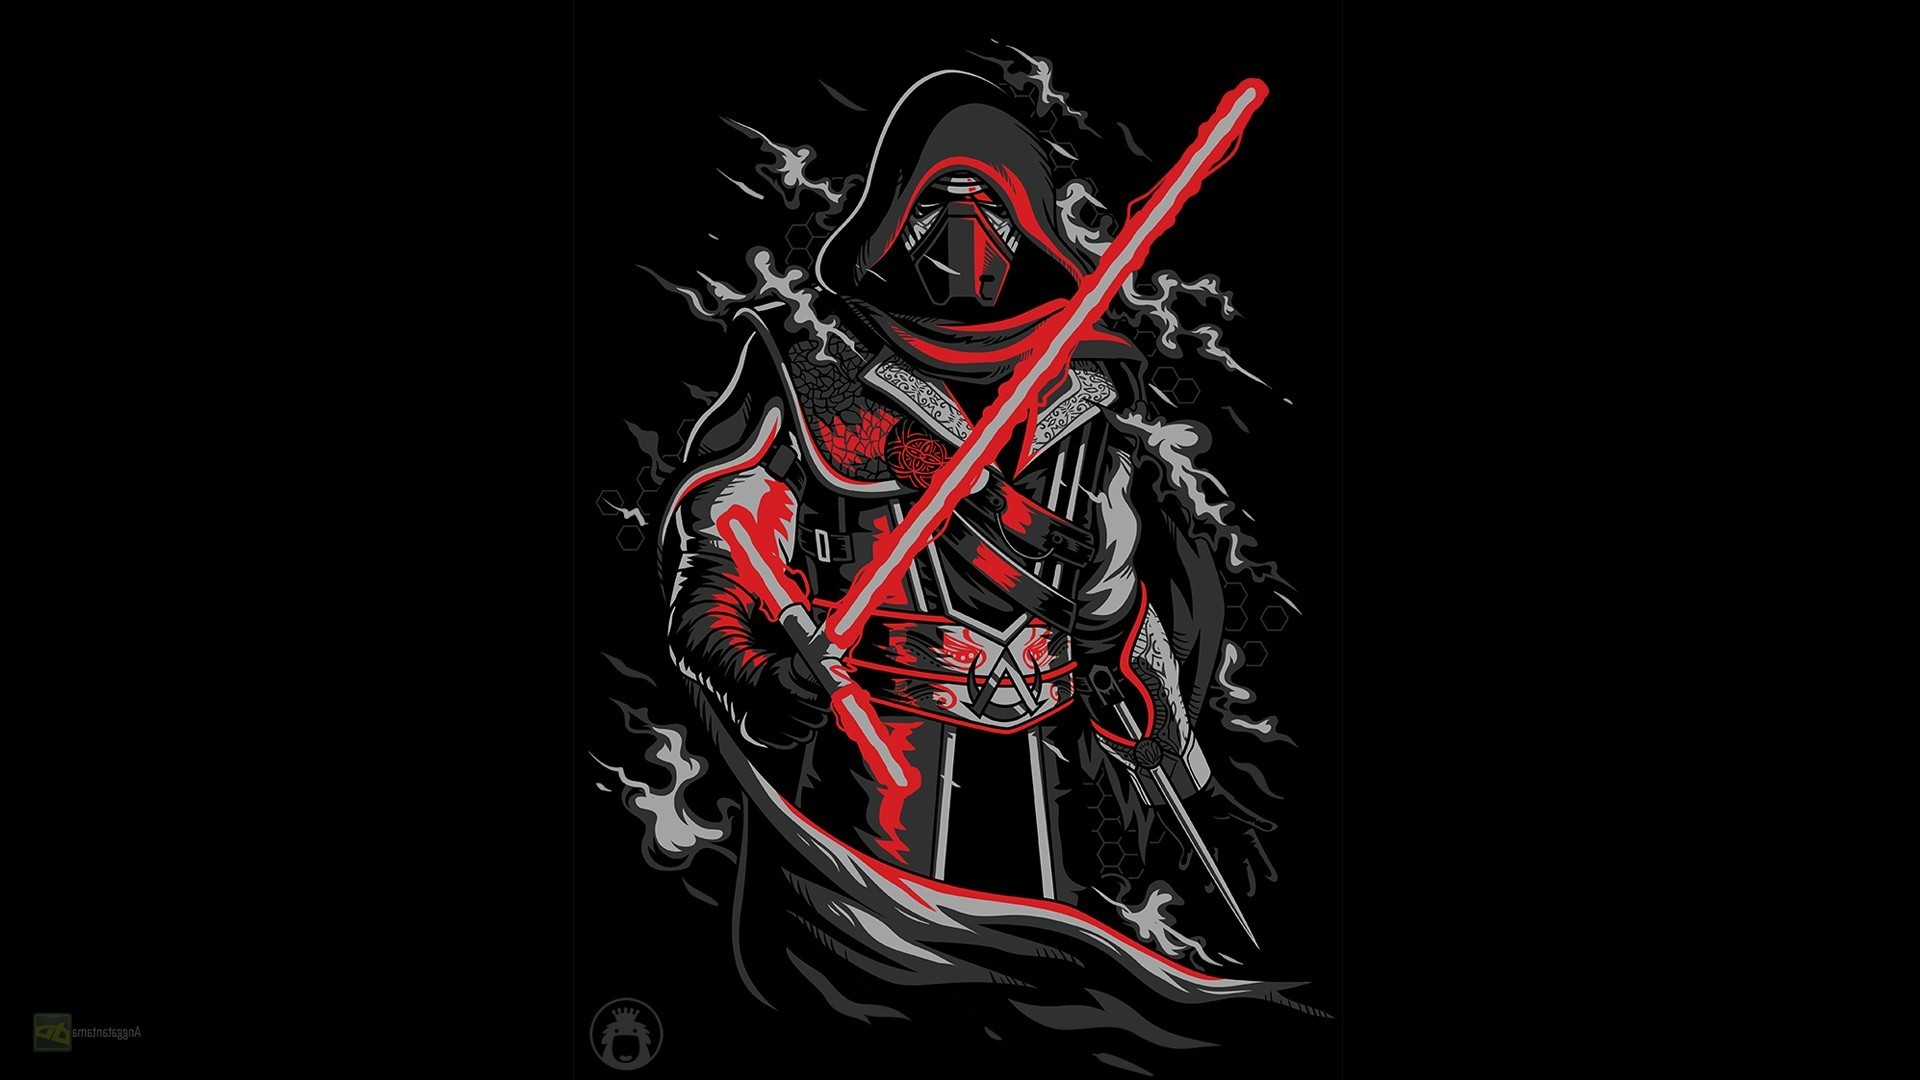 Darth Vader Wallpaper Hd Heavy Metal Movie Wallpaper Hd 52 Images